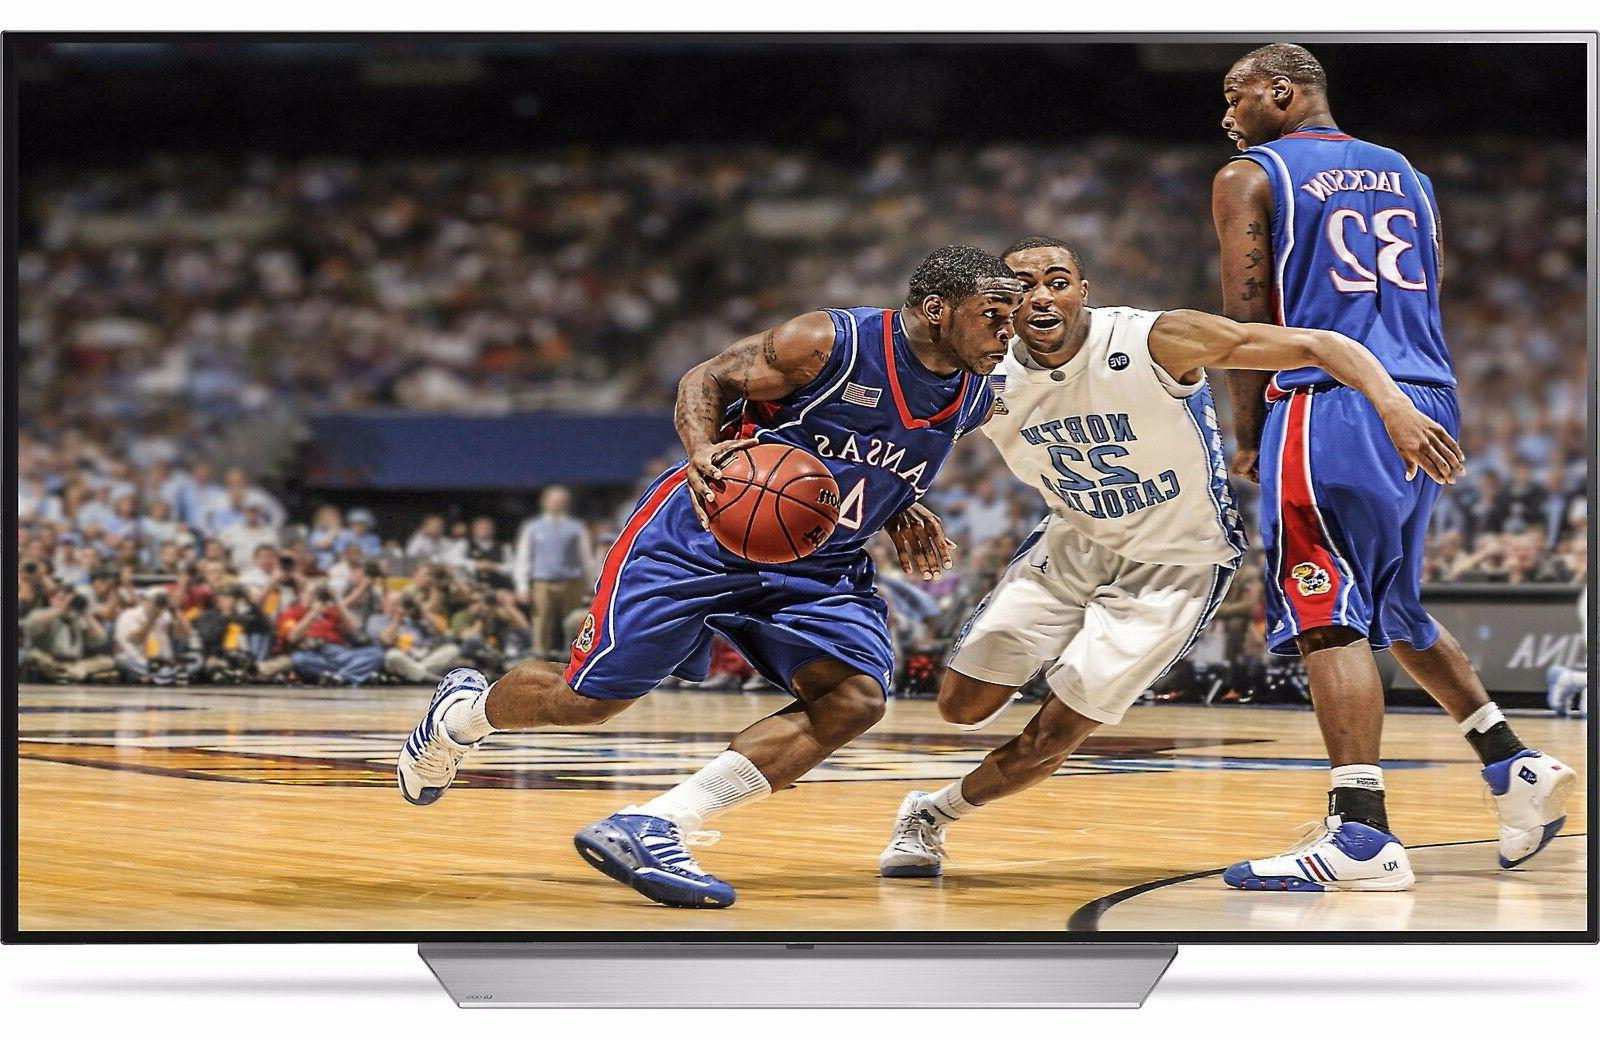 oled55c7p smart flat panel tv